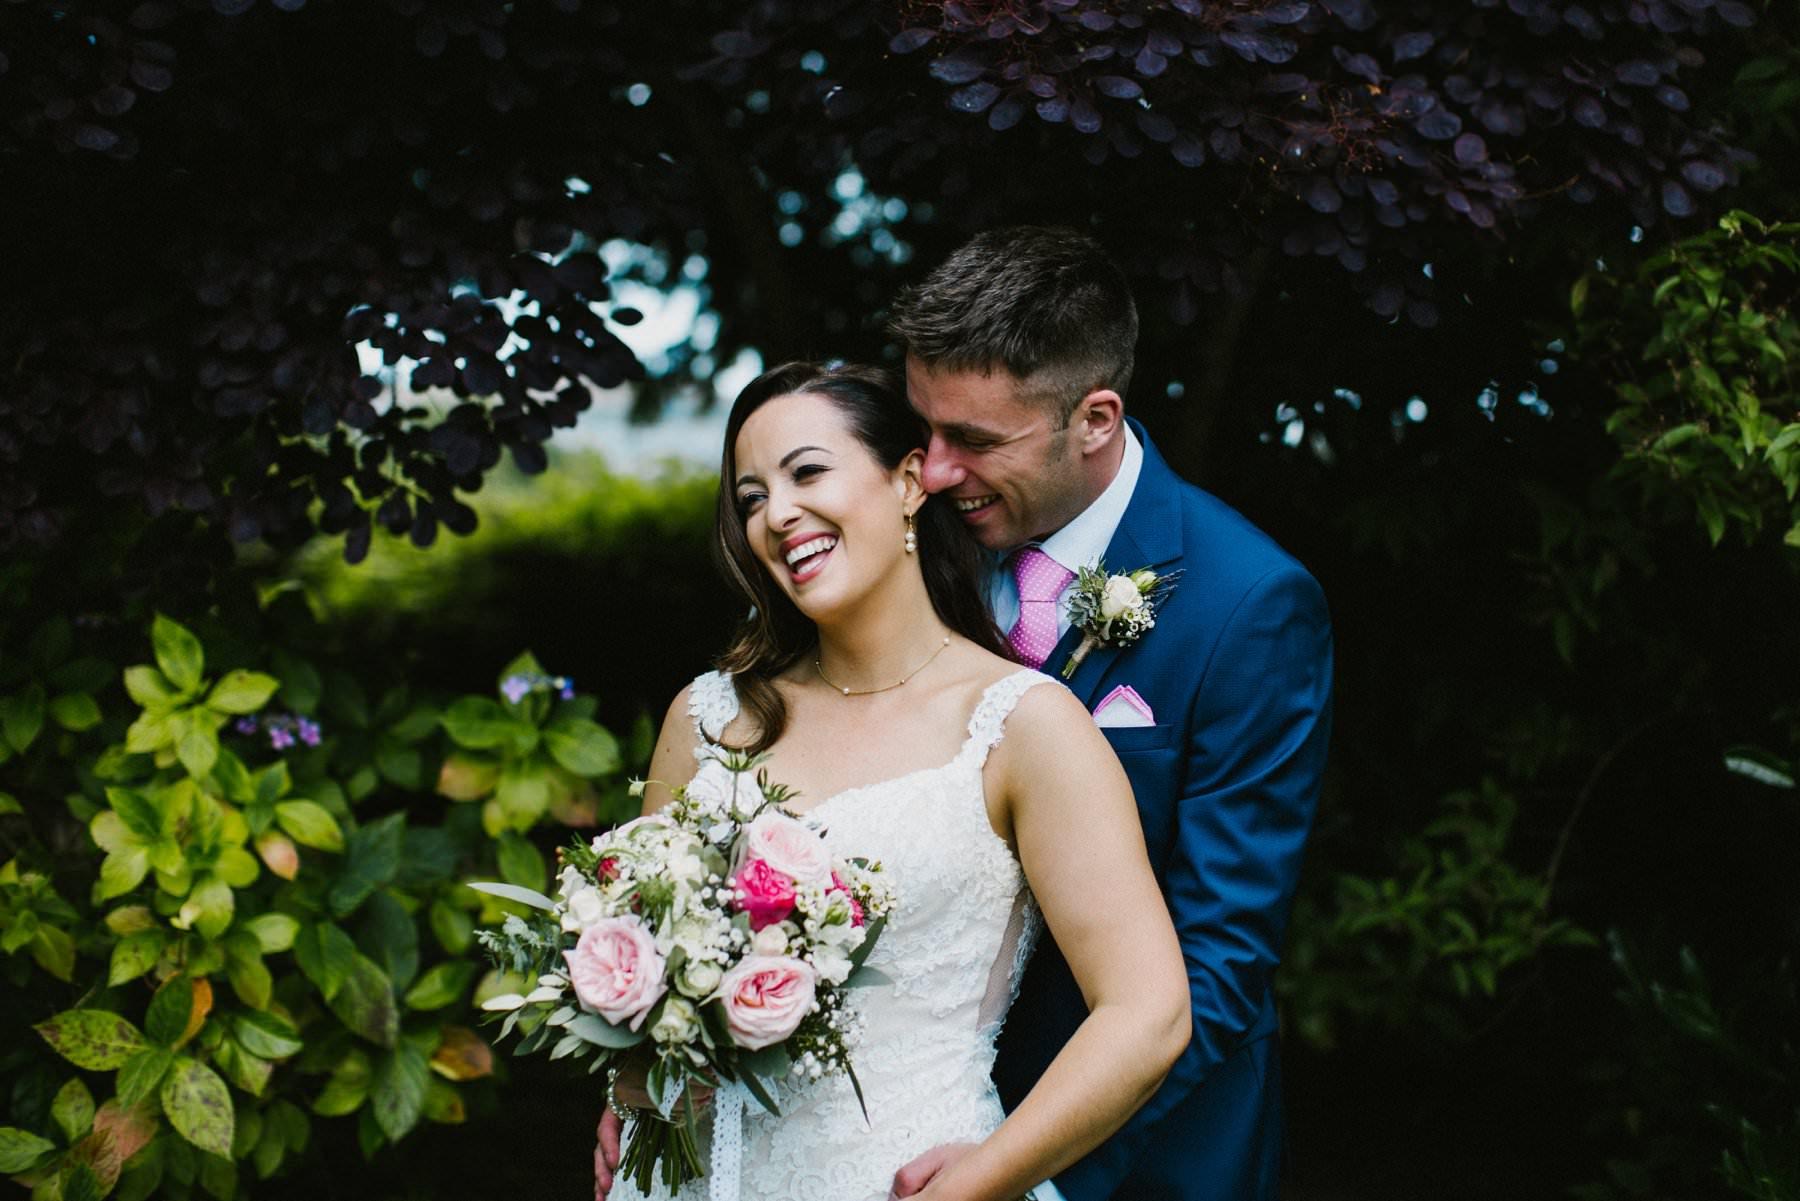 tinakilly wedding photography